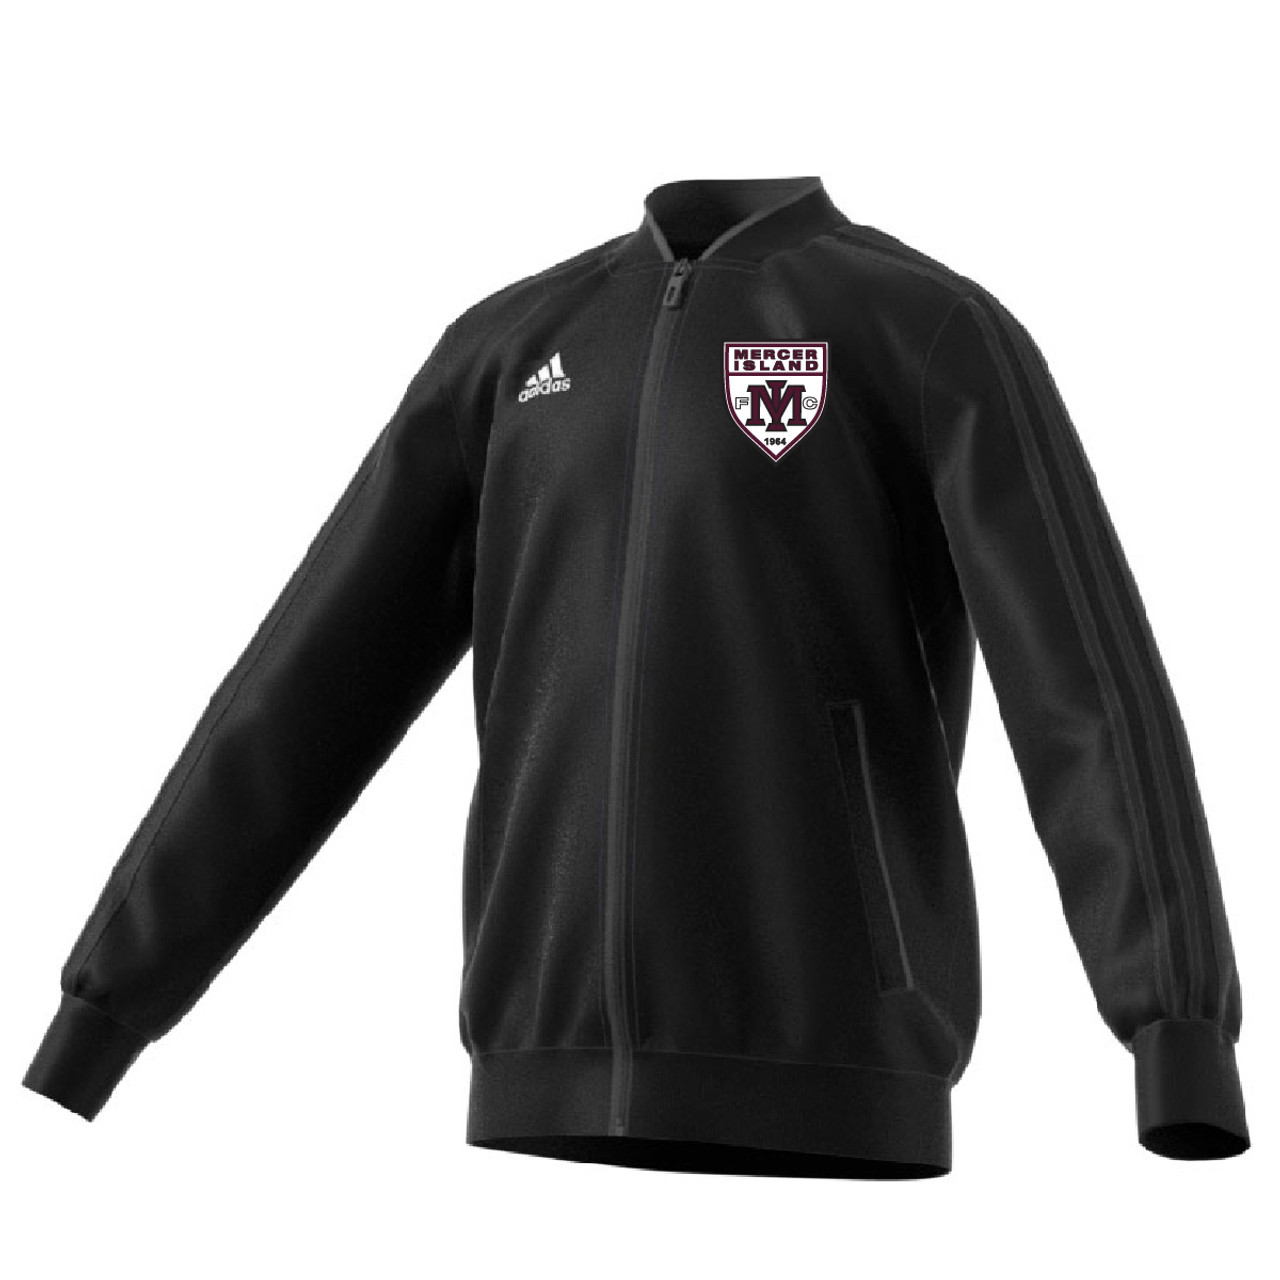 buy online 2ef86 3f250 adidas Condivo 18 Training Jacket (MIFC) - Soccer City